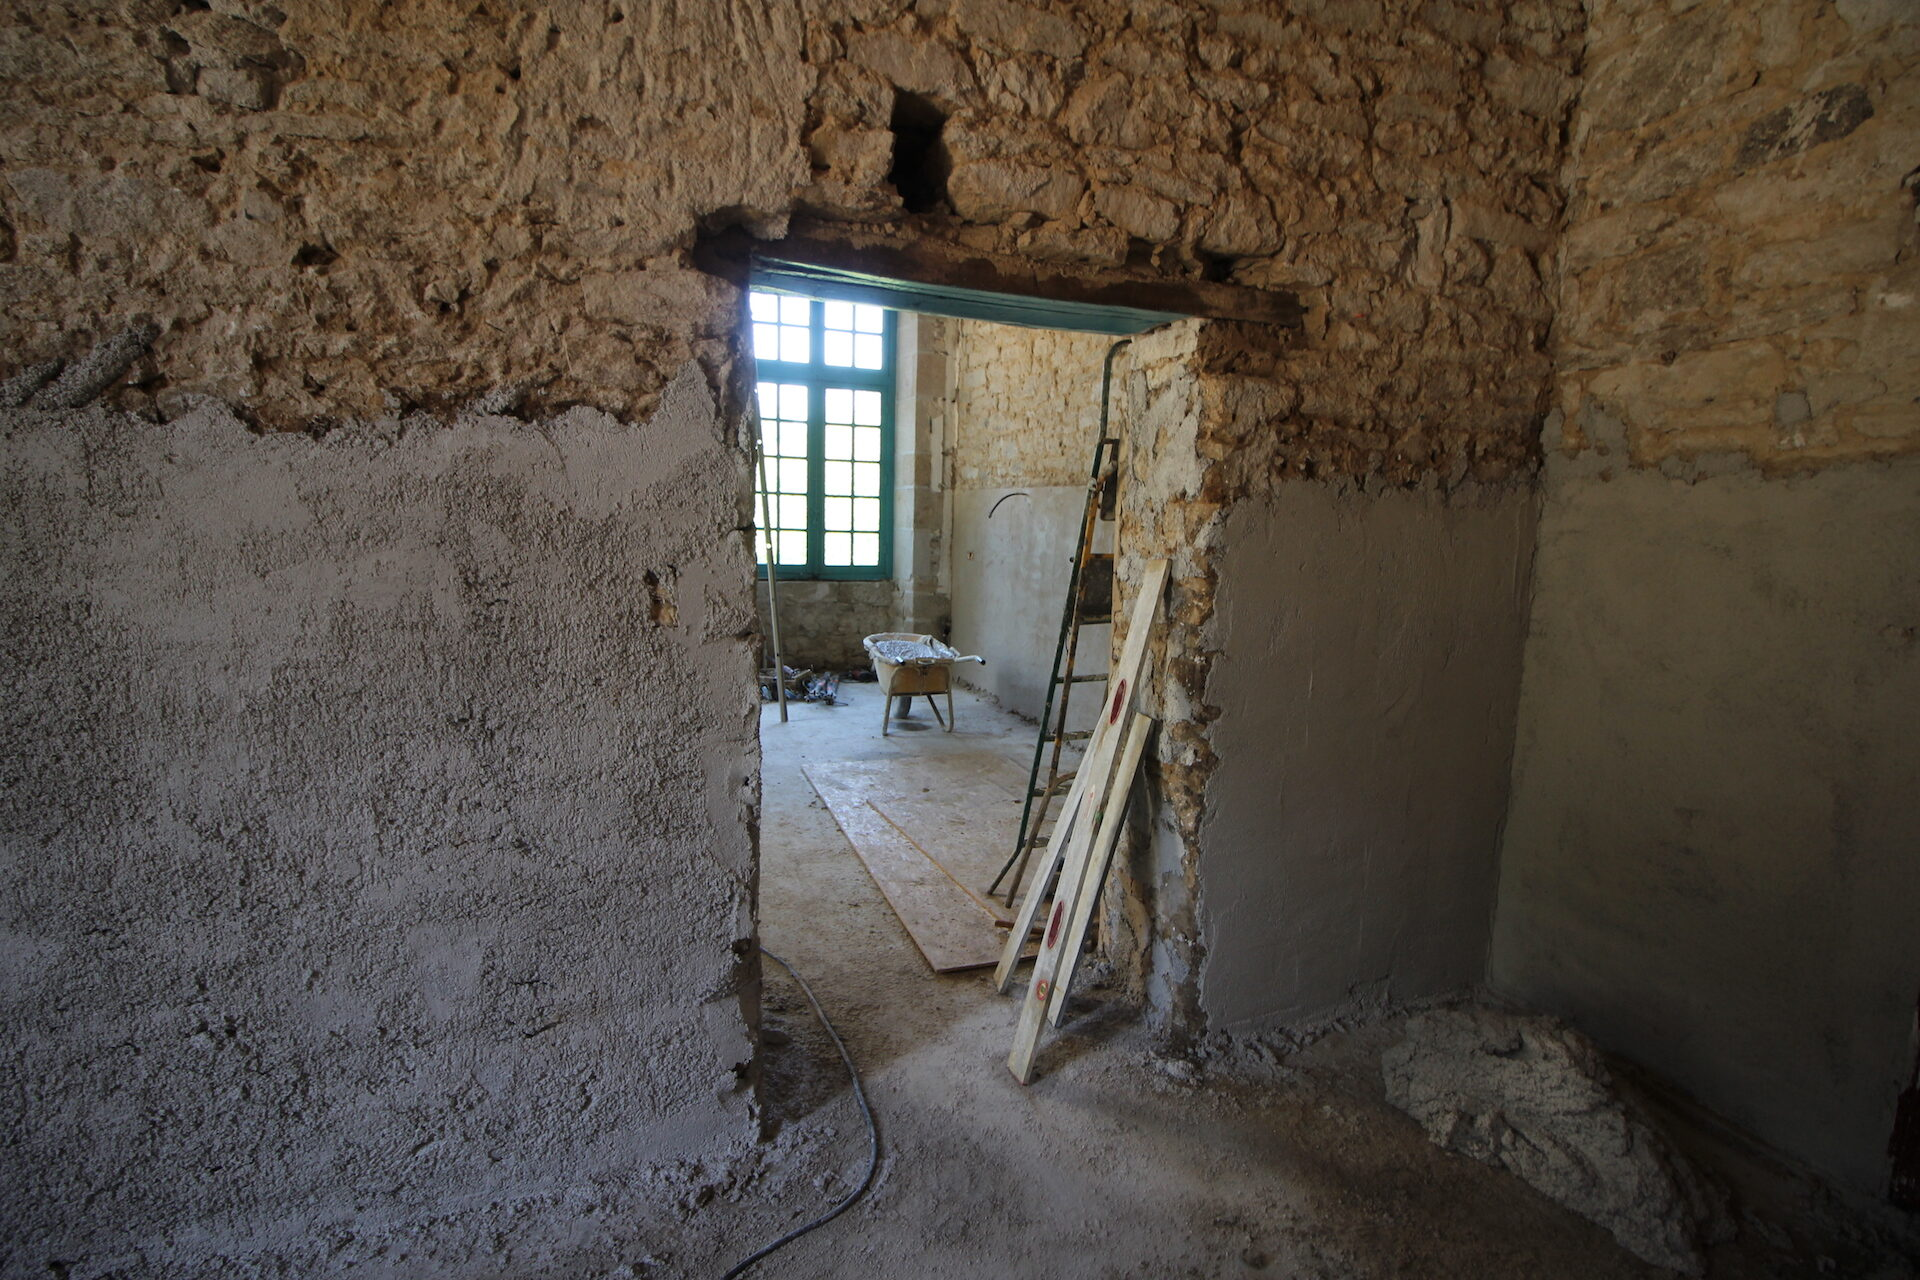 CSDK Lissage de murs en terre Bretagne 5 1920x1280 - Engagement durable - CSDK Lissage de murs en terre Bretagne 5 1920x1280